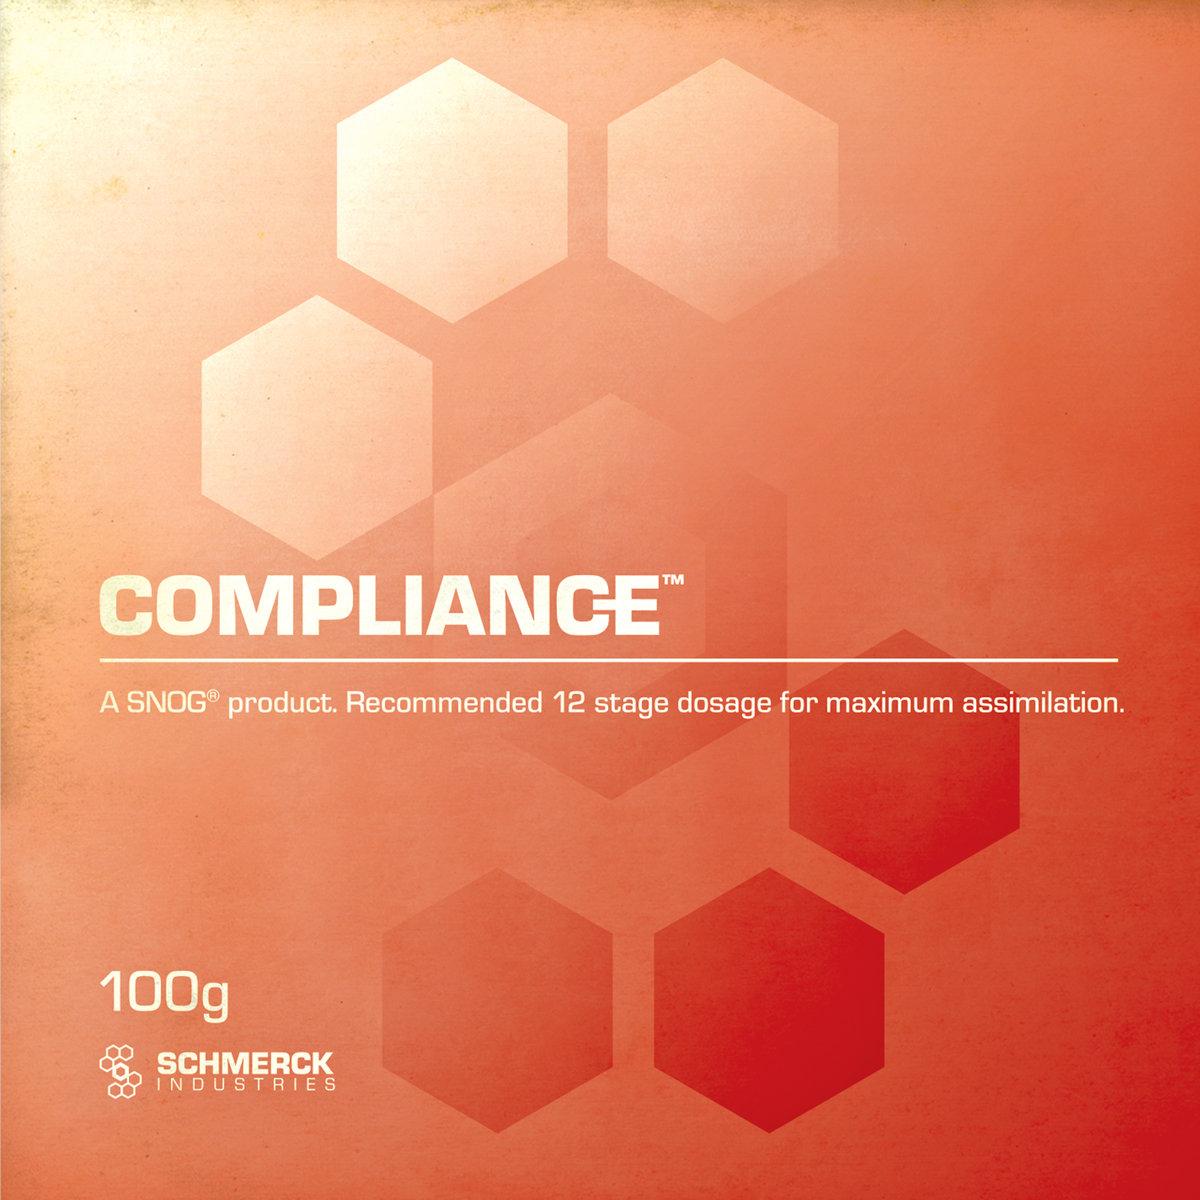 Compliance - Snog